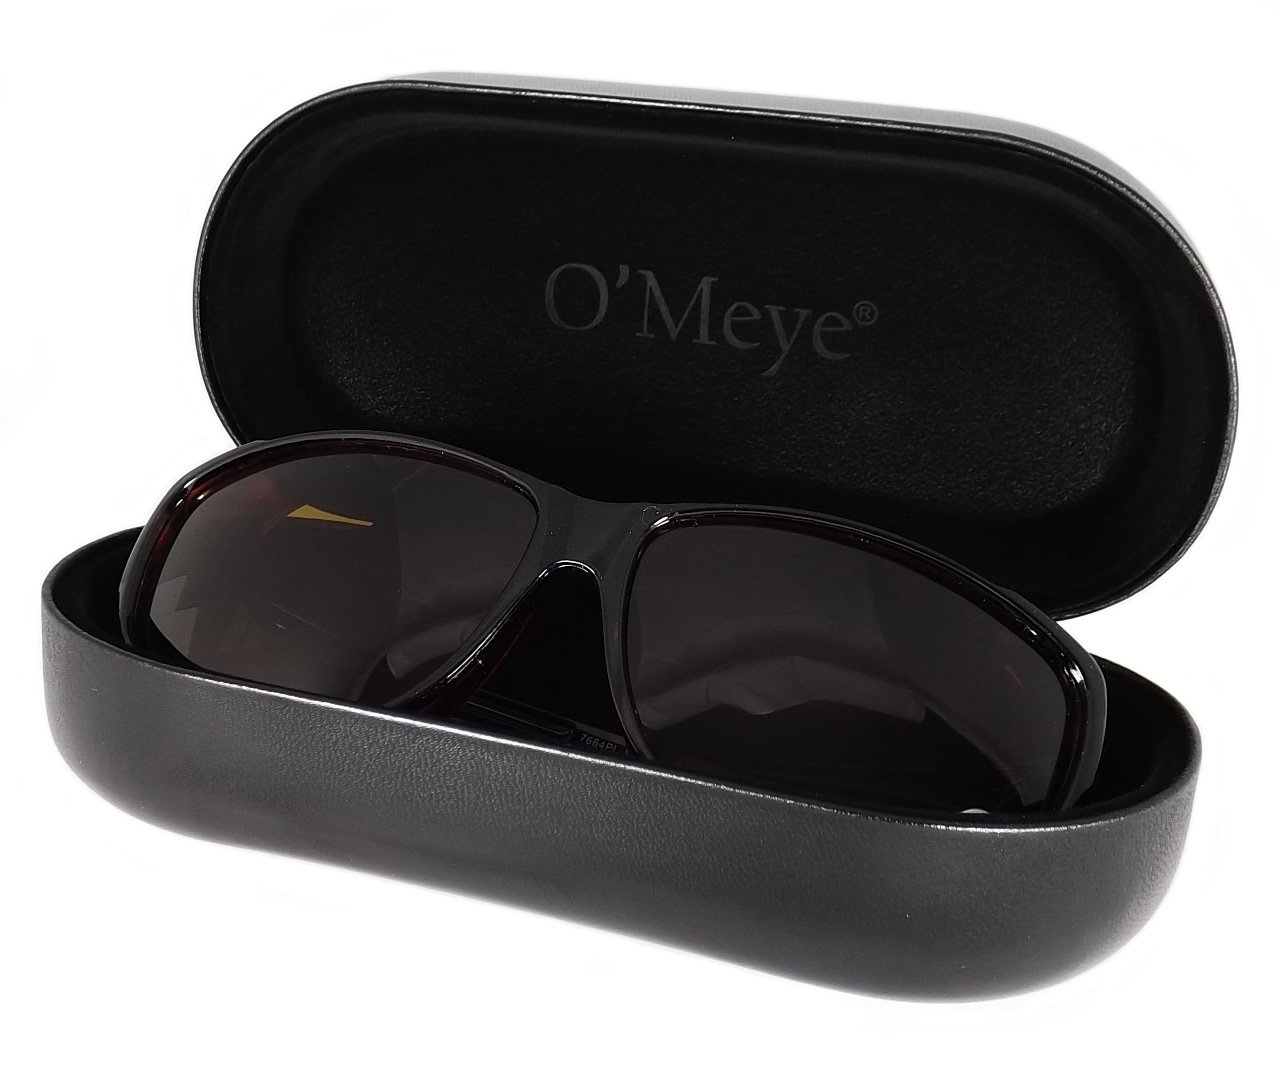 Amazon.com  Ultra-Extra Large Hard Eyeglass   Sunglasses Case for Fit  Over Safety Glasses - 3 Piece Set for Men   Women - O Meye® Case 7546496917b9